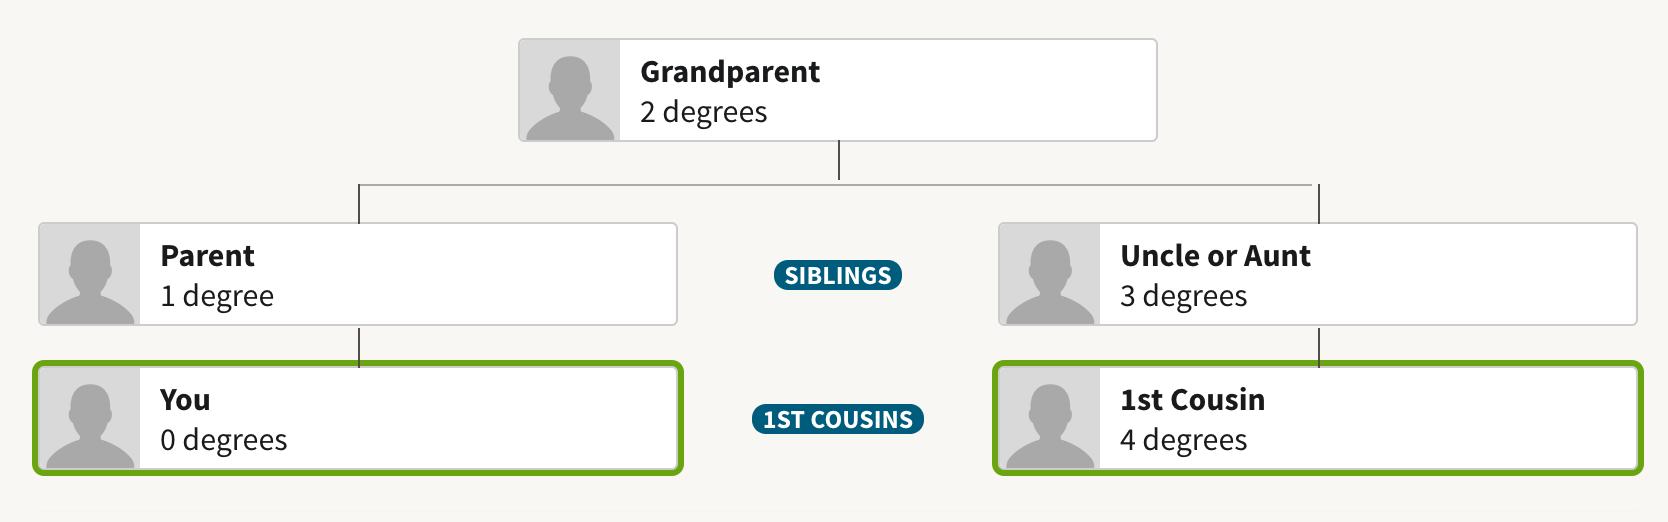 AncestryDNA® Match Categories